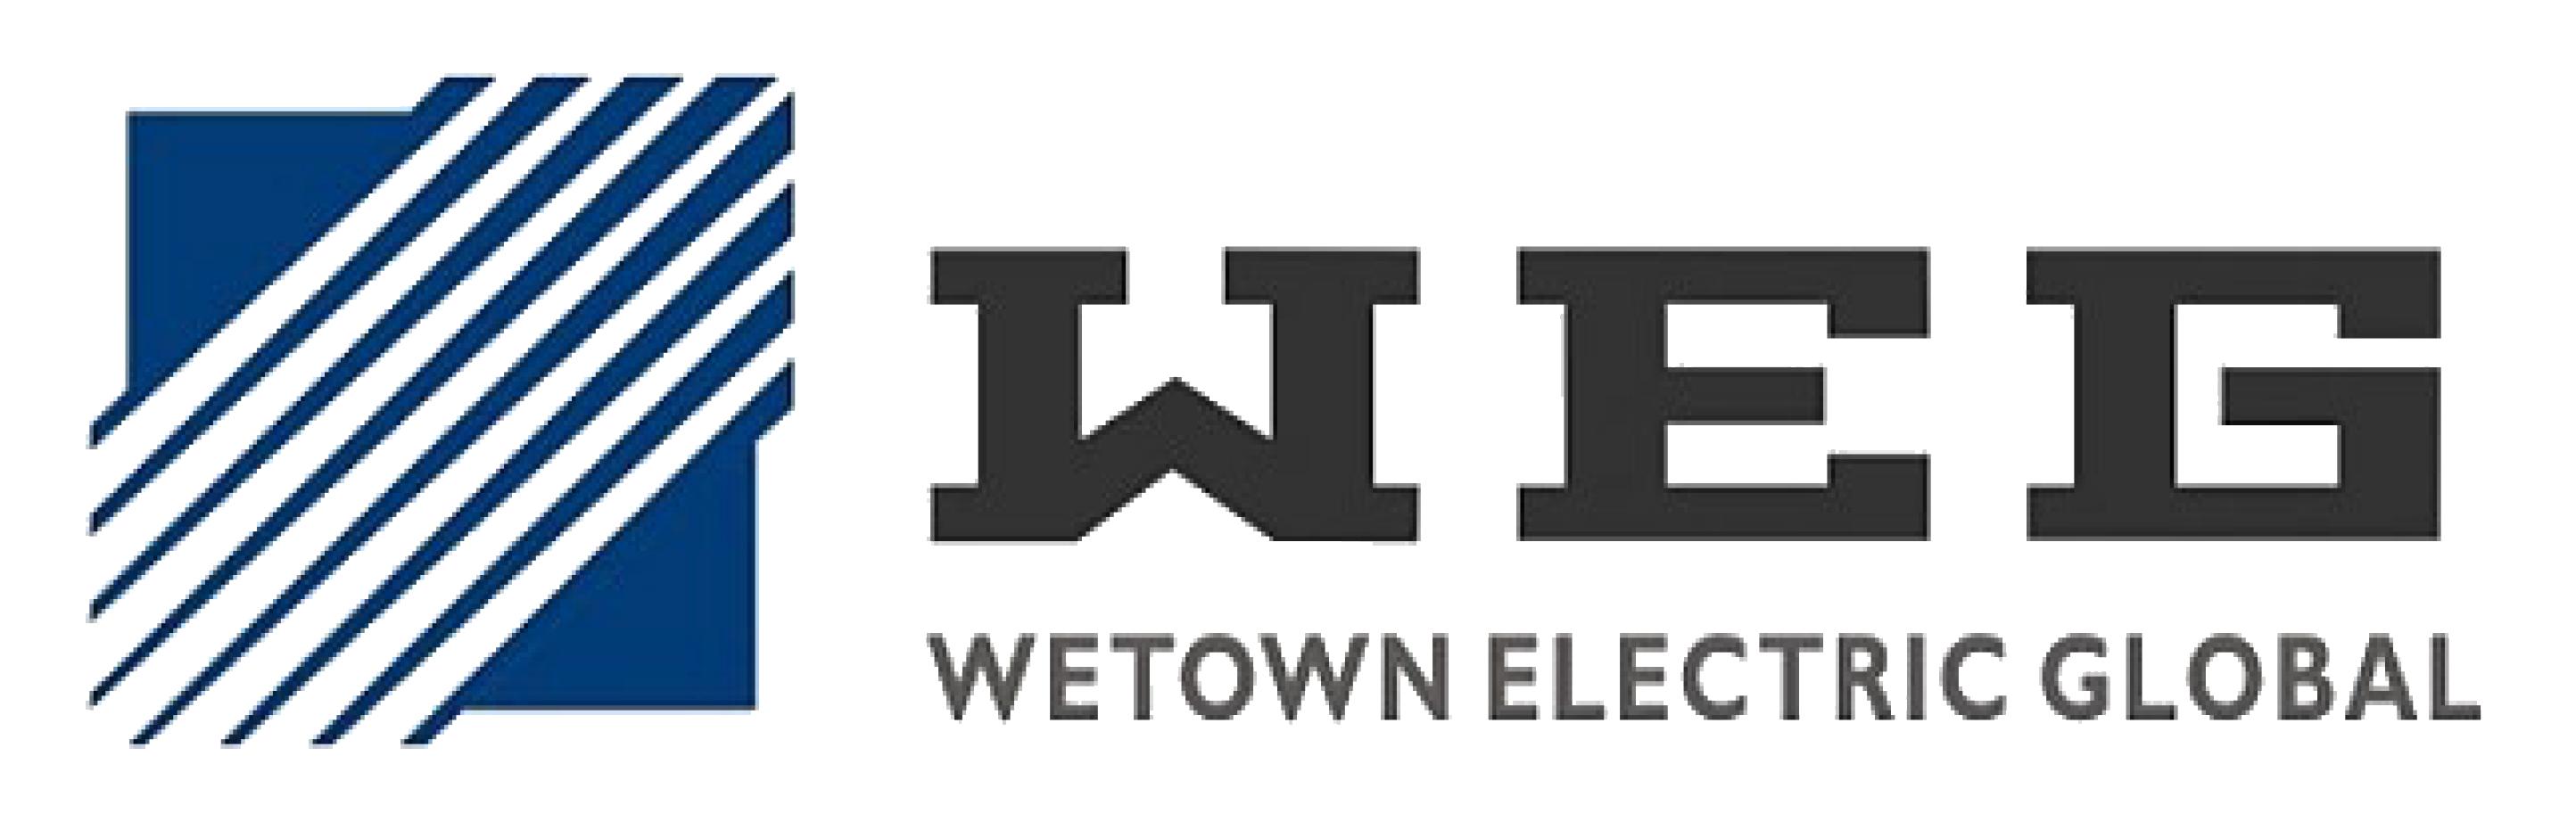 Wetown Electric (Global) Co., Ltd.